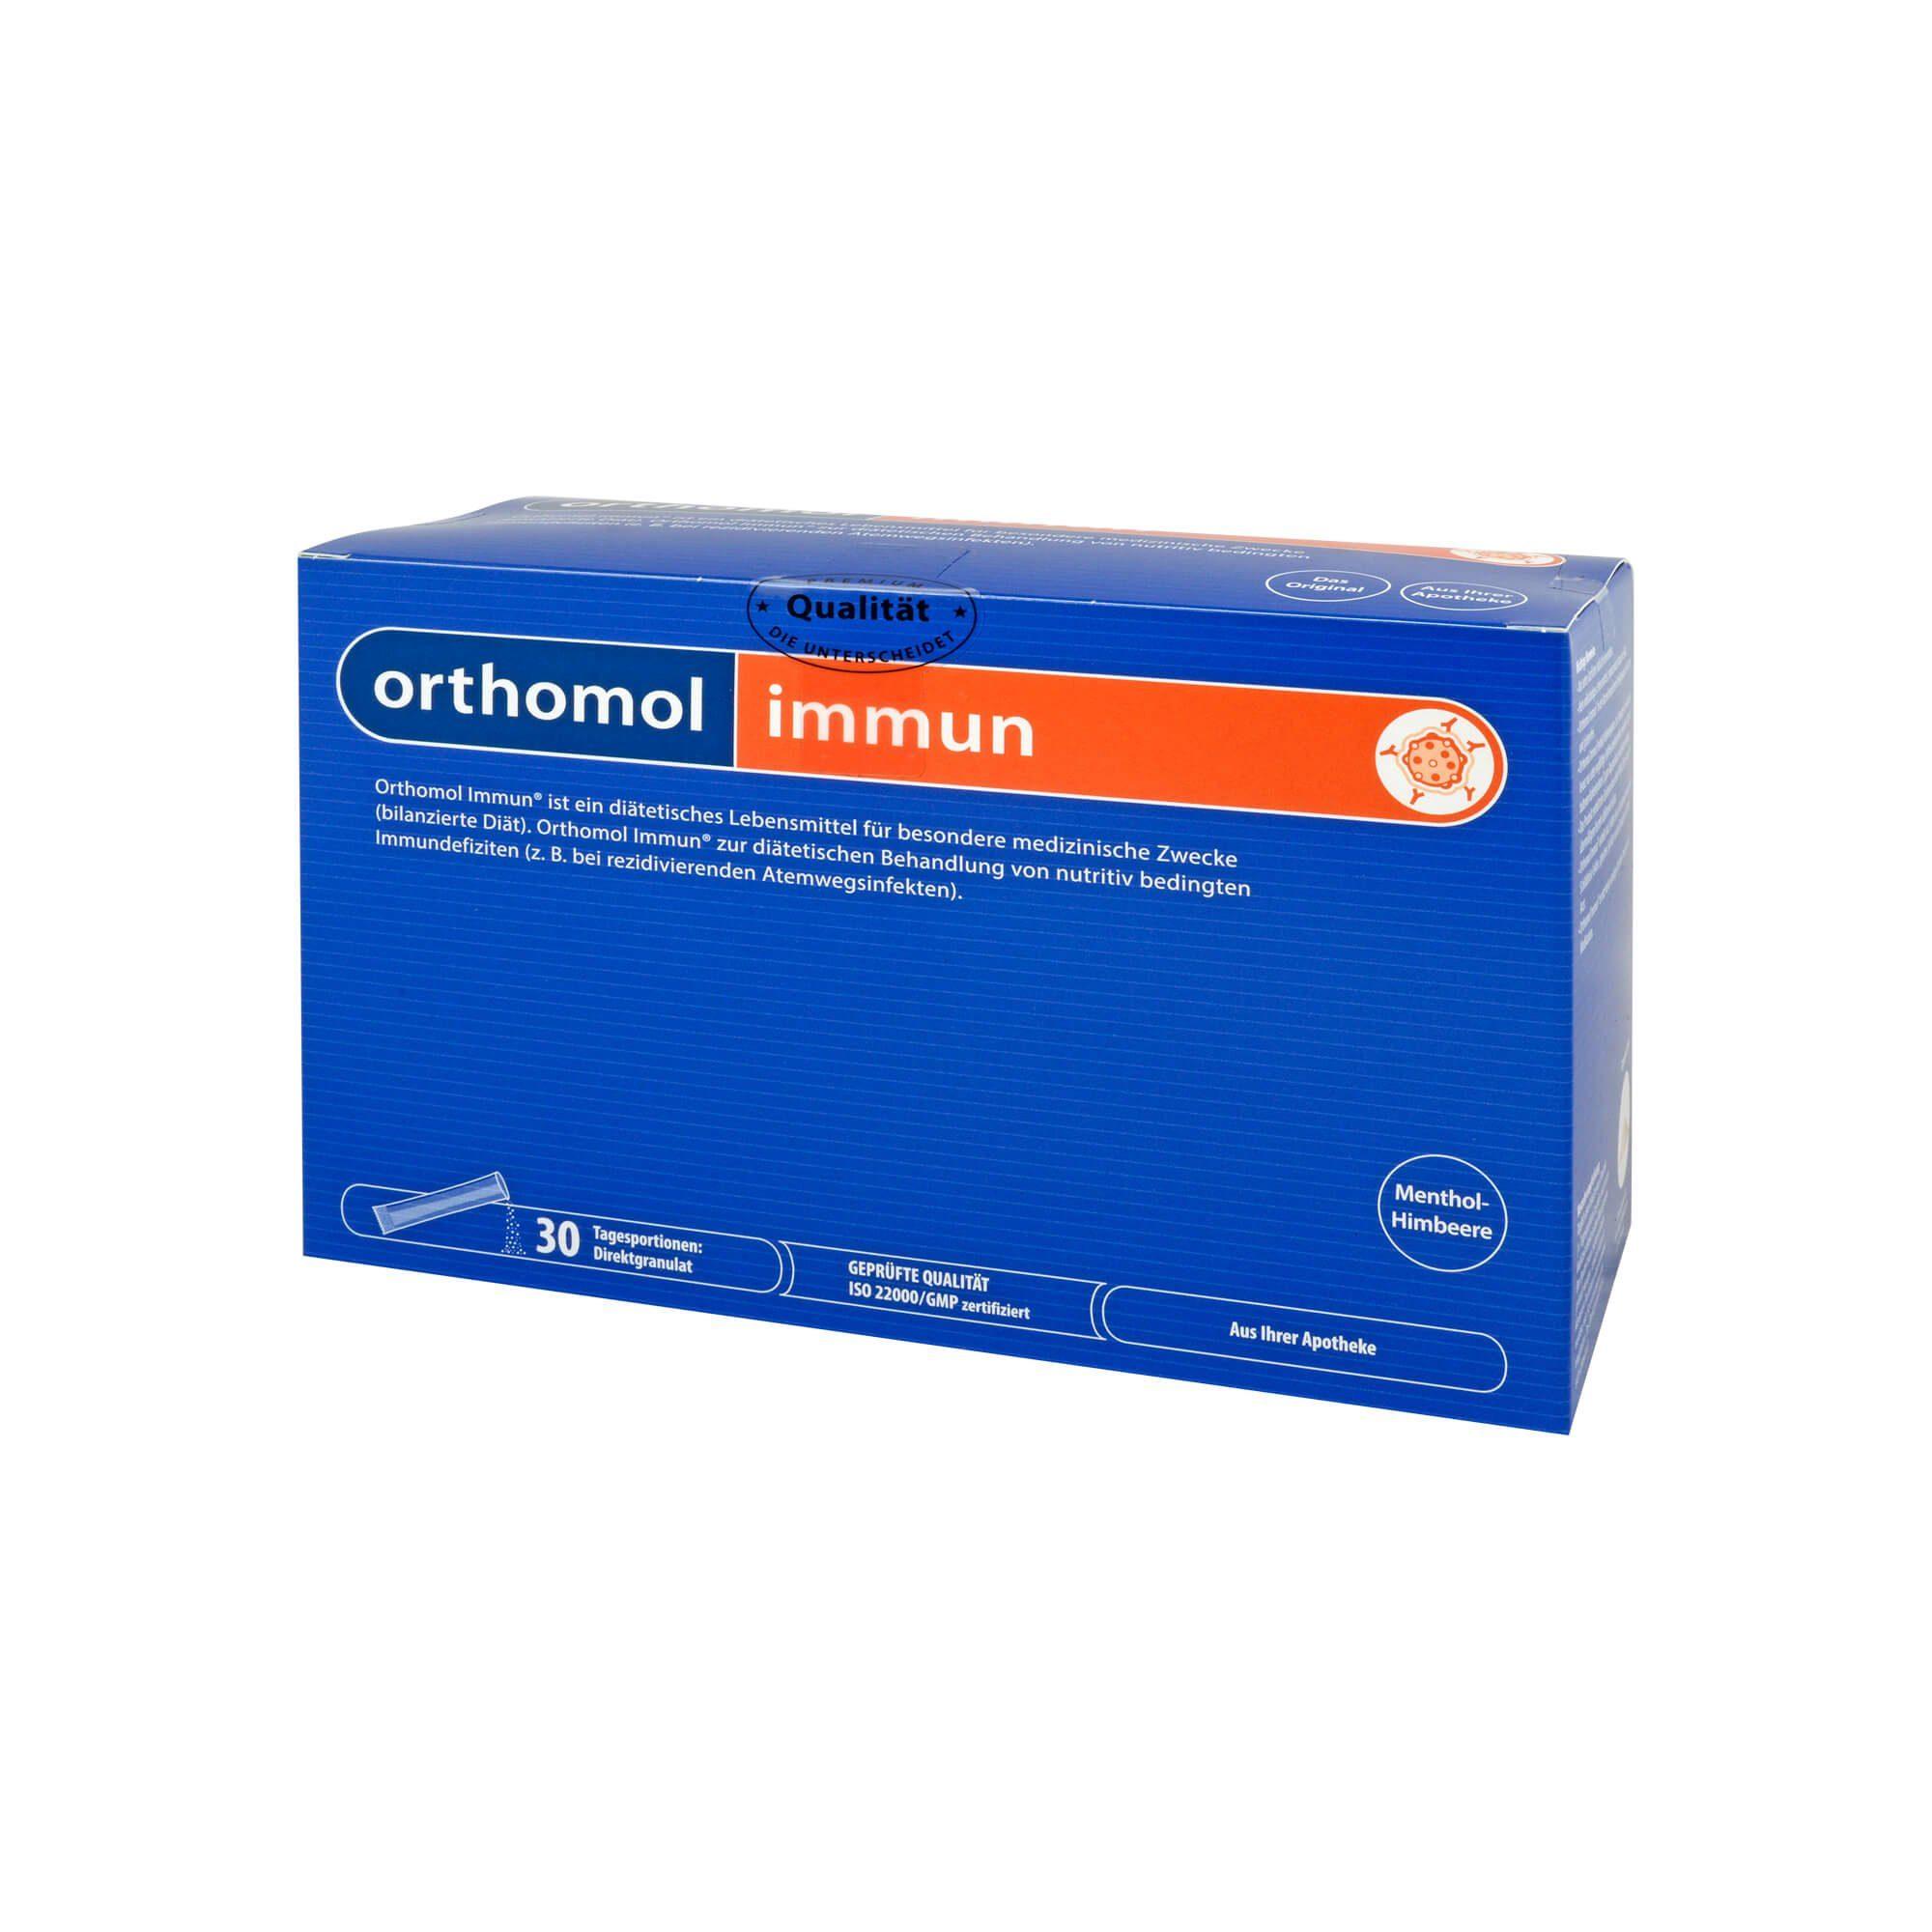 Orthomol Immun Direktgranulat Himbeer/Menthol, 30 St